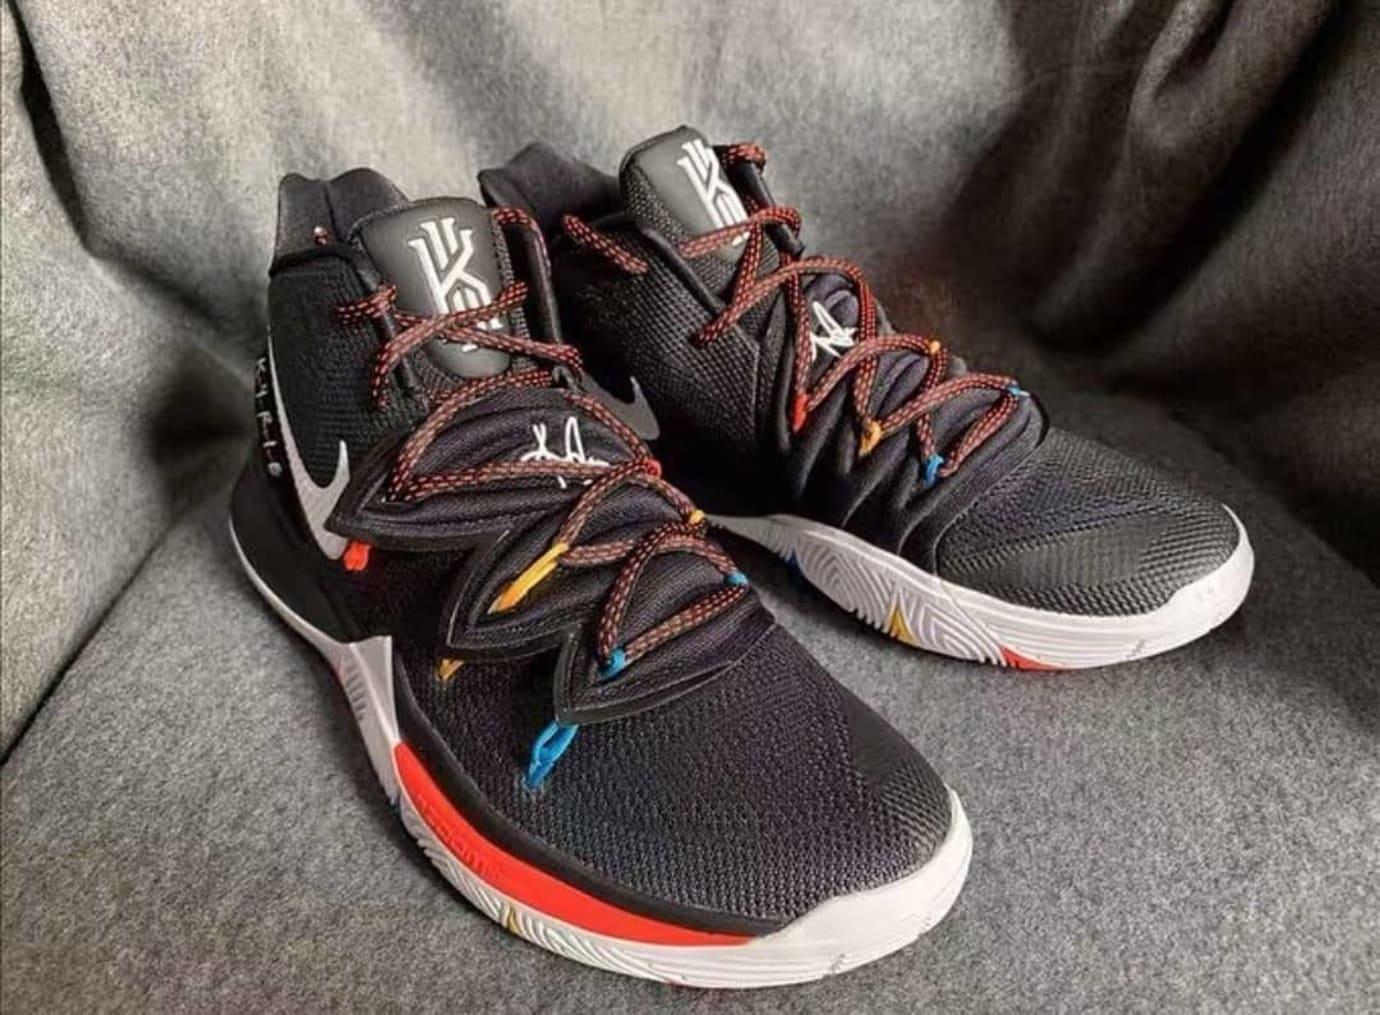 Nike Kyrie 5 'Friends' (Pair 3)